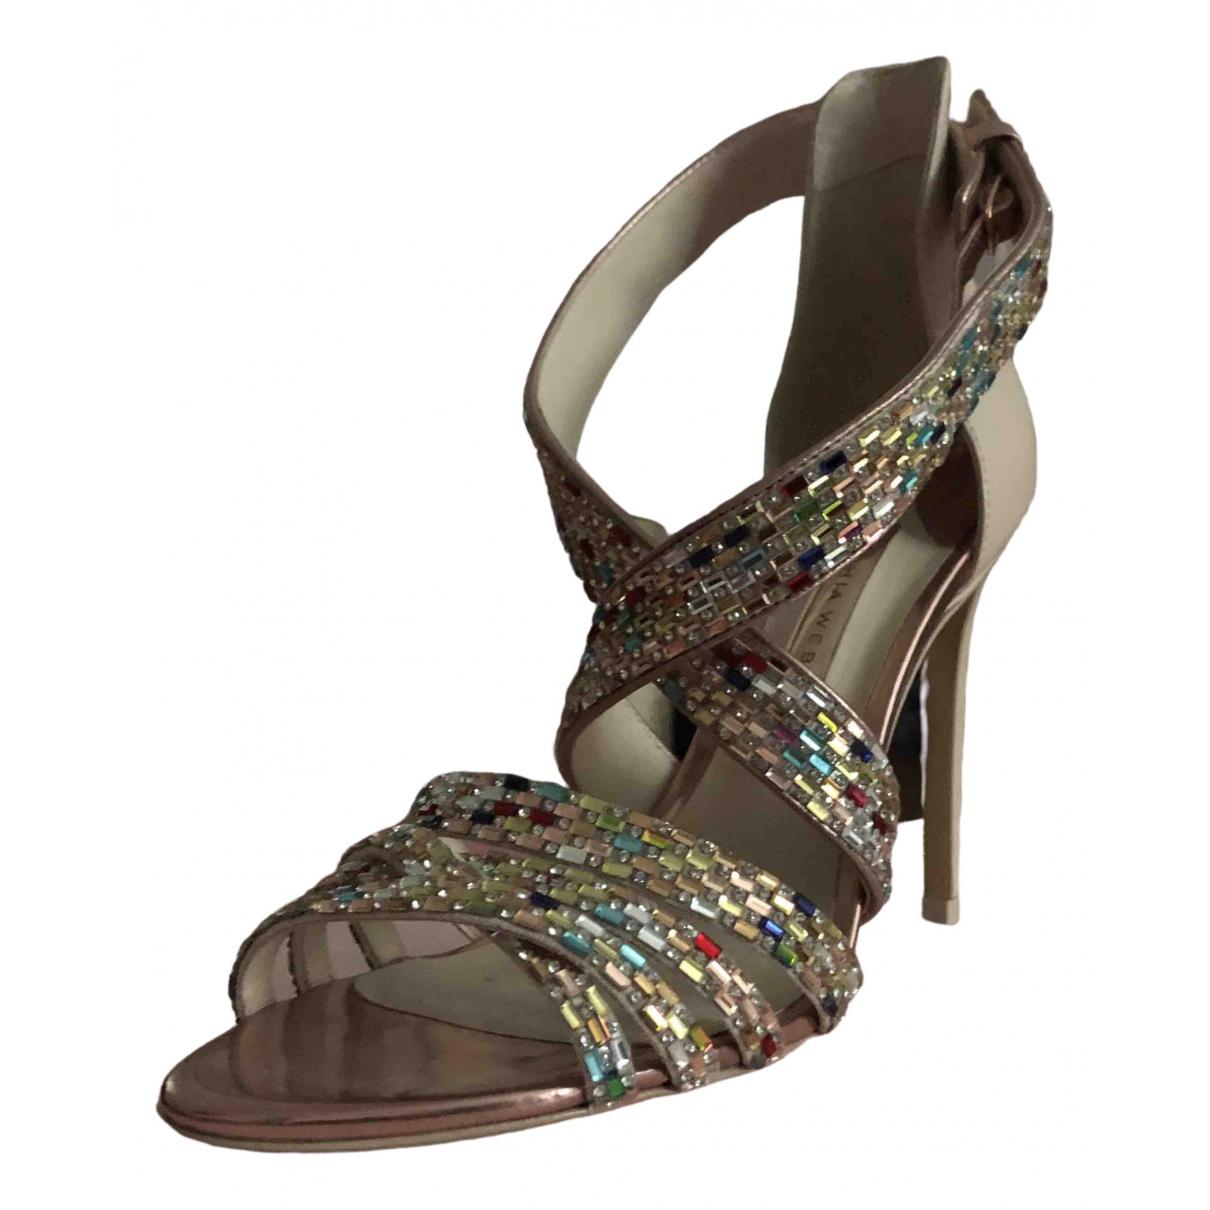 Sophia Webster \N Metallic Leather Sandals for Women 38.5 EU